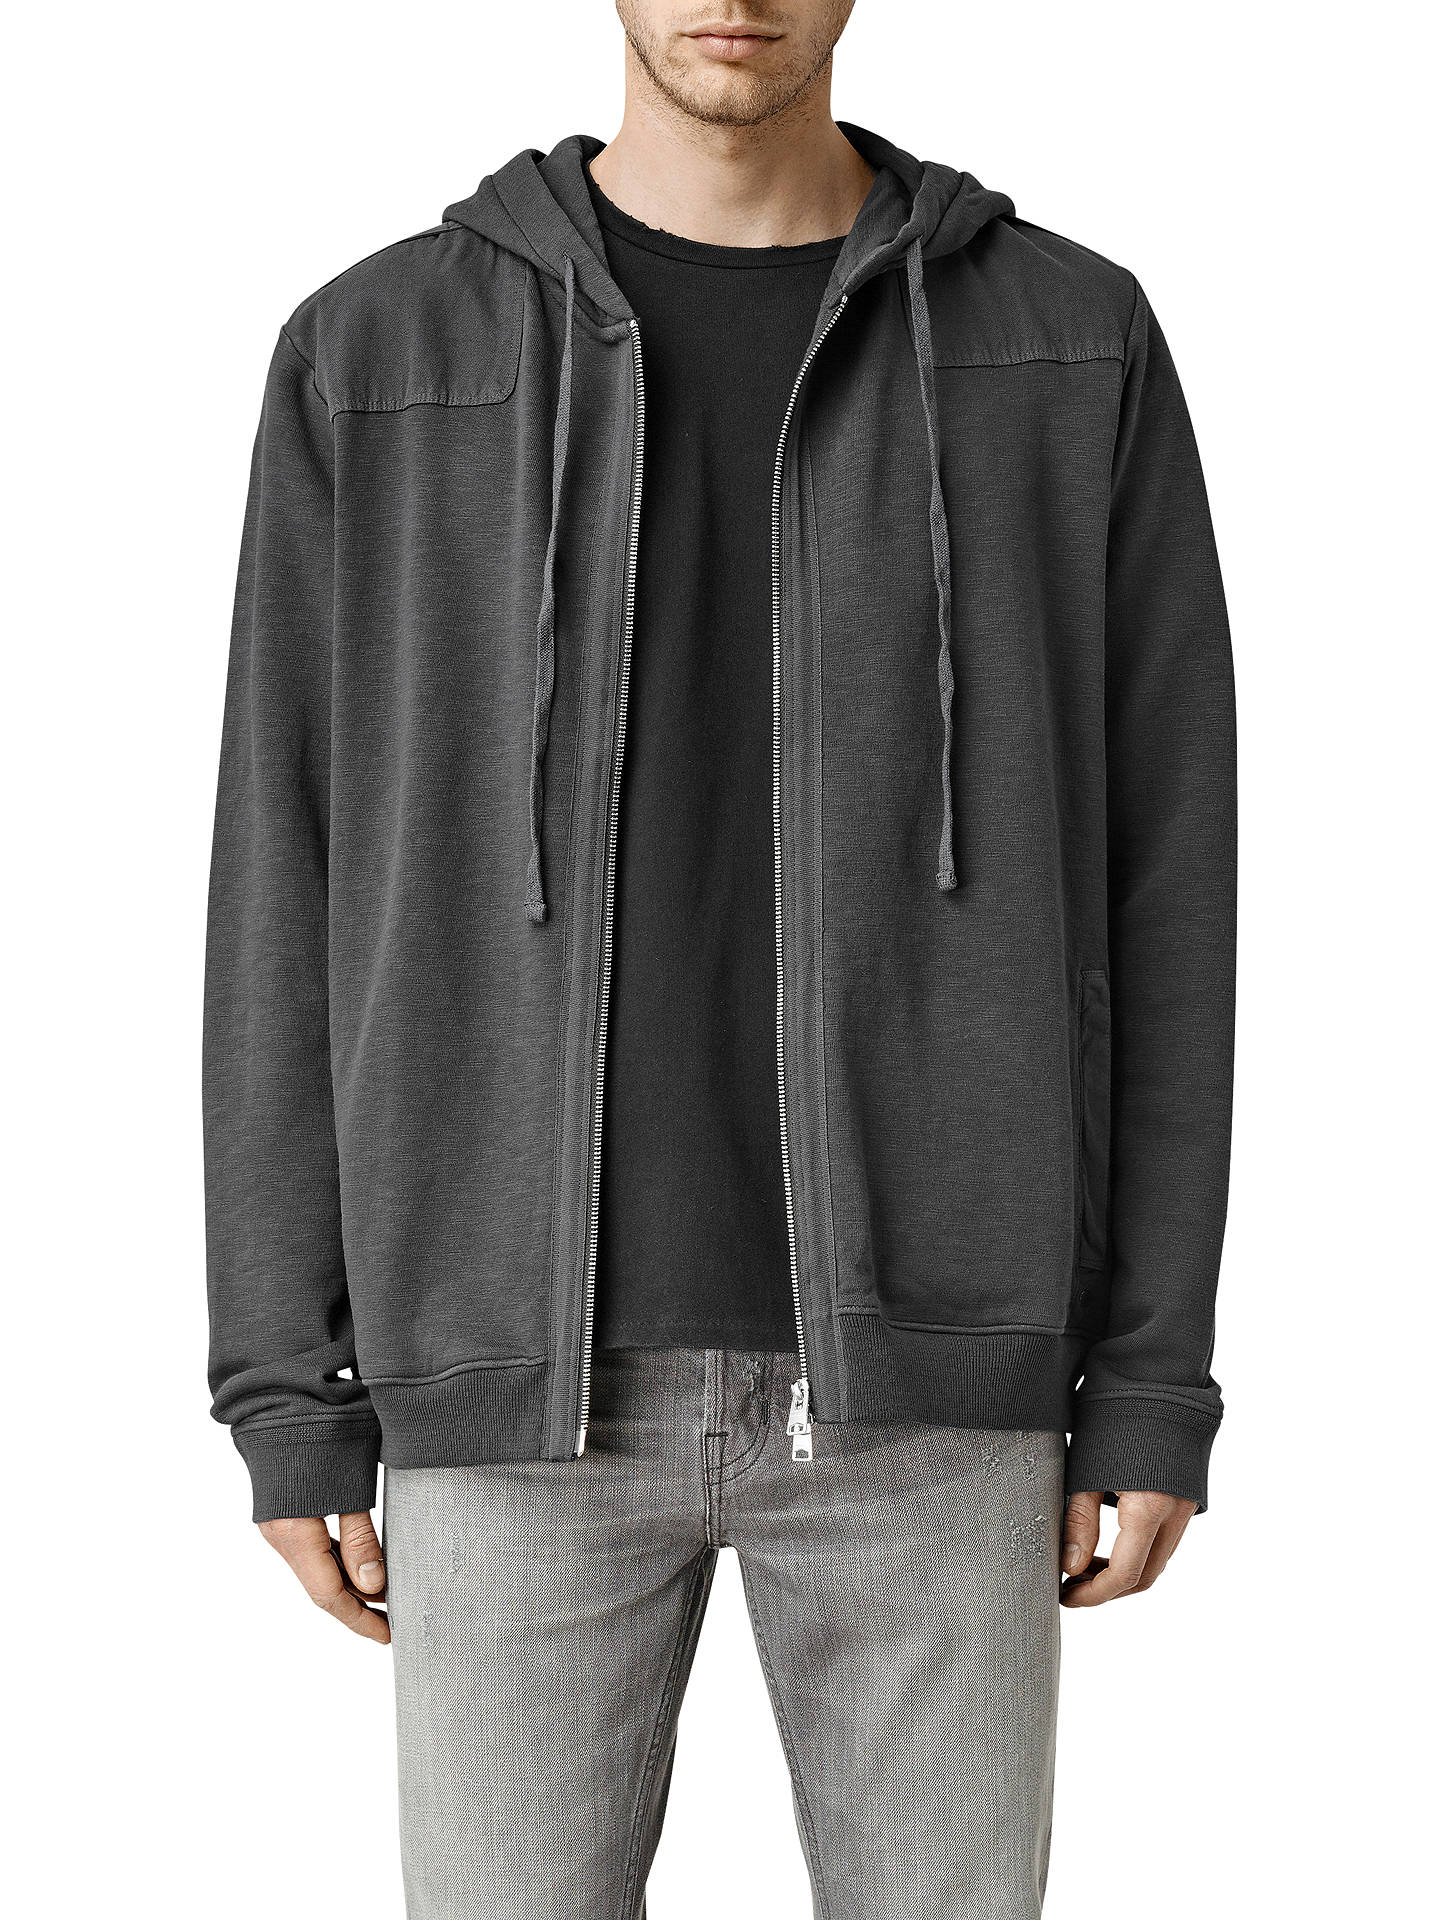 7d7c0dd6 Buy AllSaints Drewest Full Zip Hoodie, Washed Black, XS Online at  johnlewis.com ...